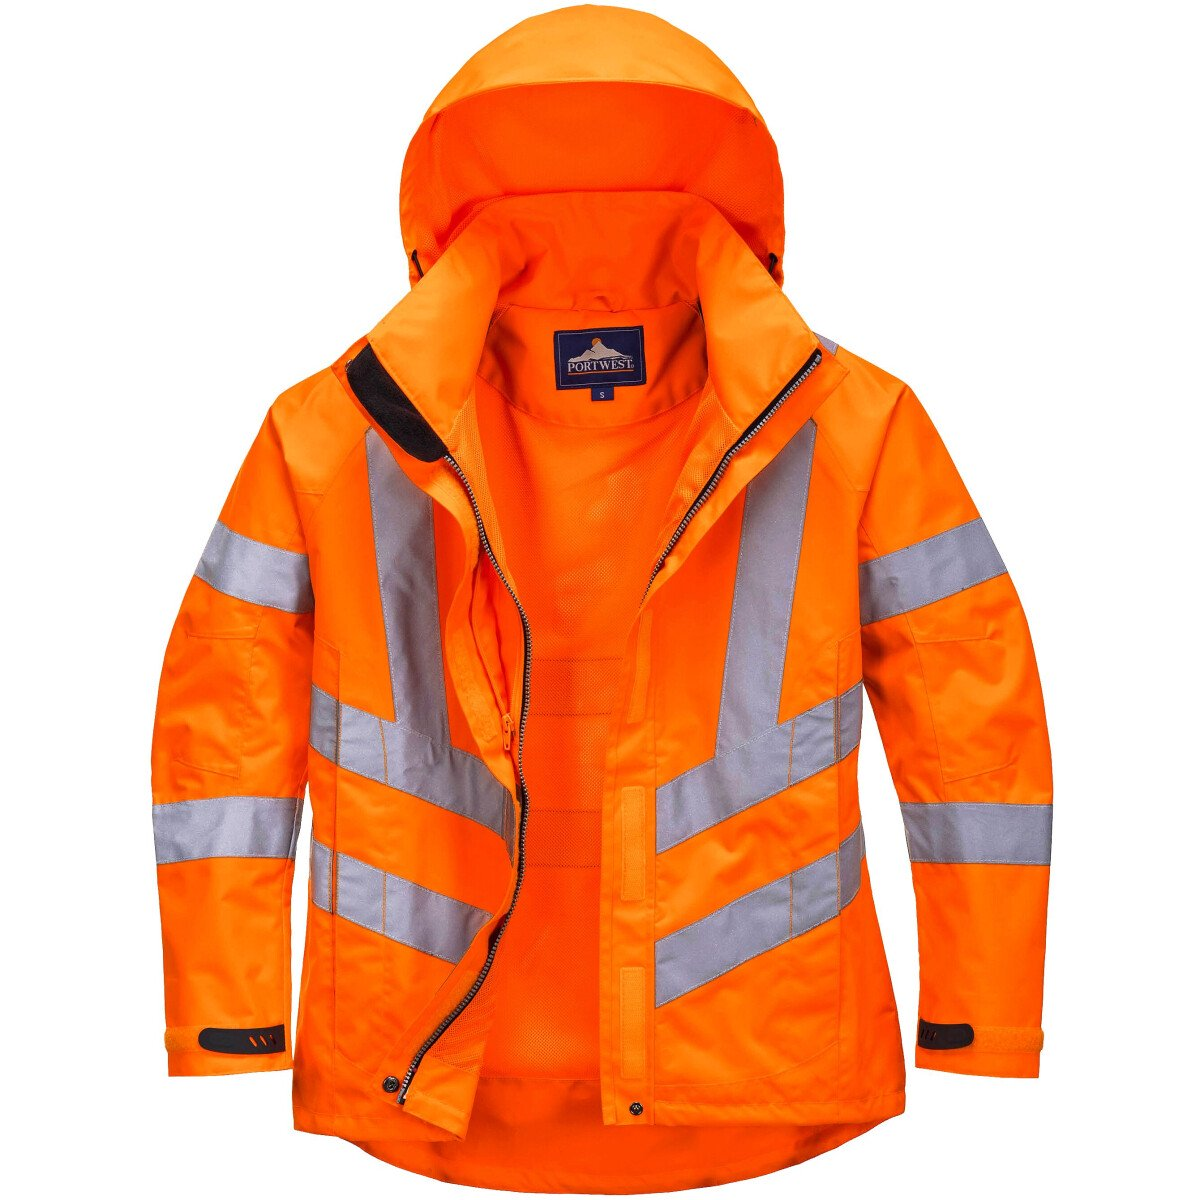 Portwest LW70 Ladies Hi-Vis Breathable Jacket High Visibility - Orange